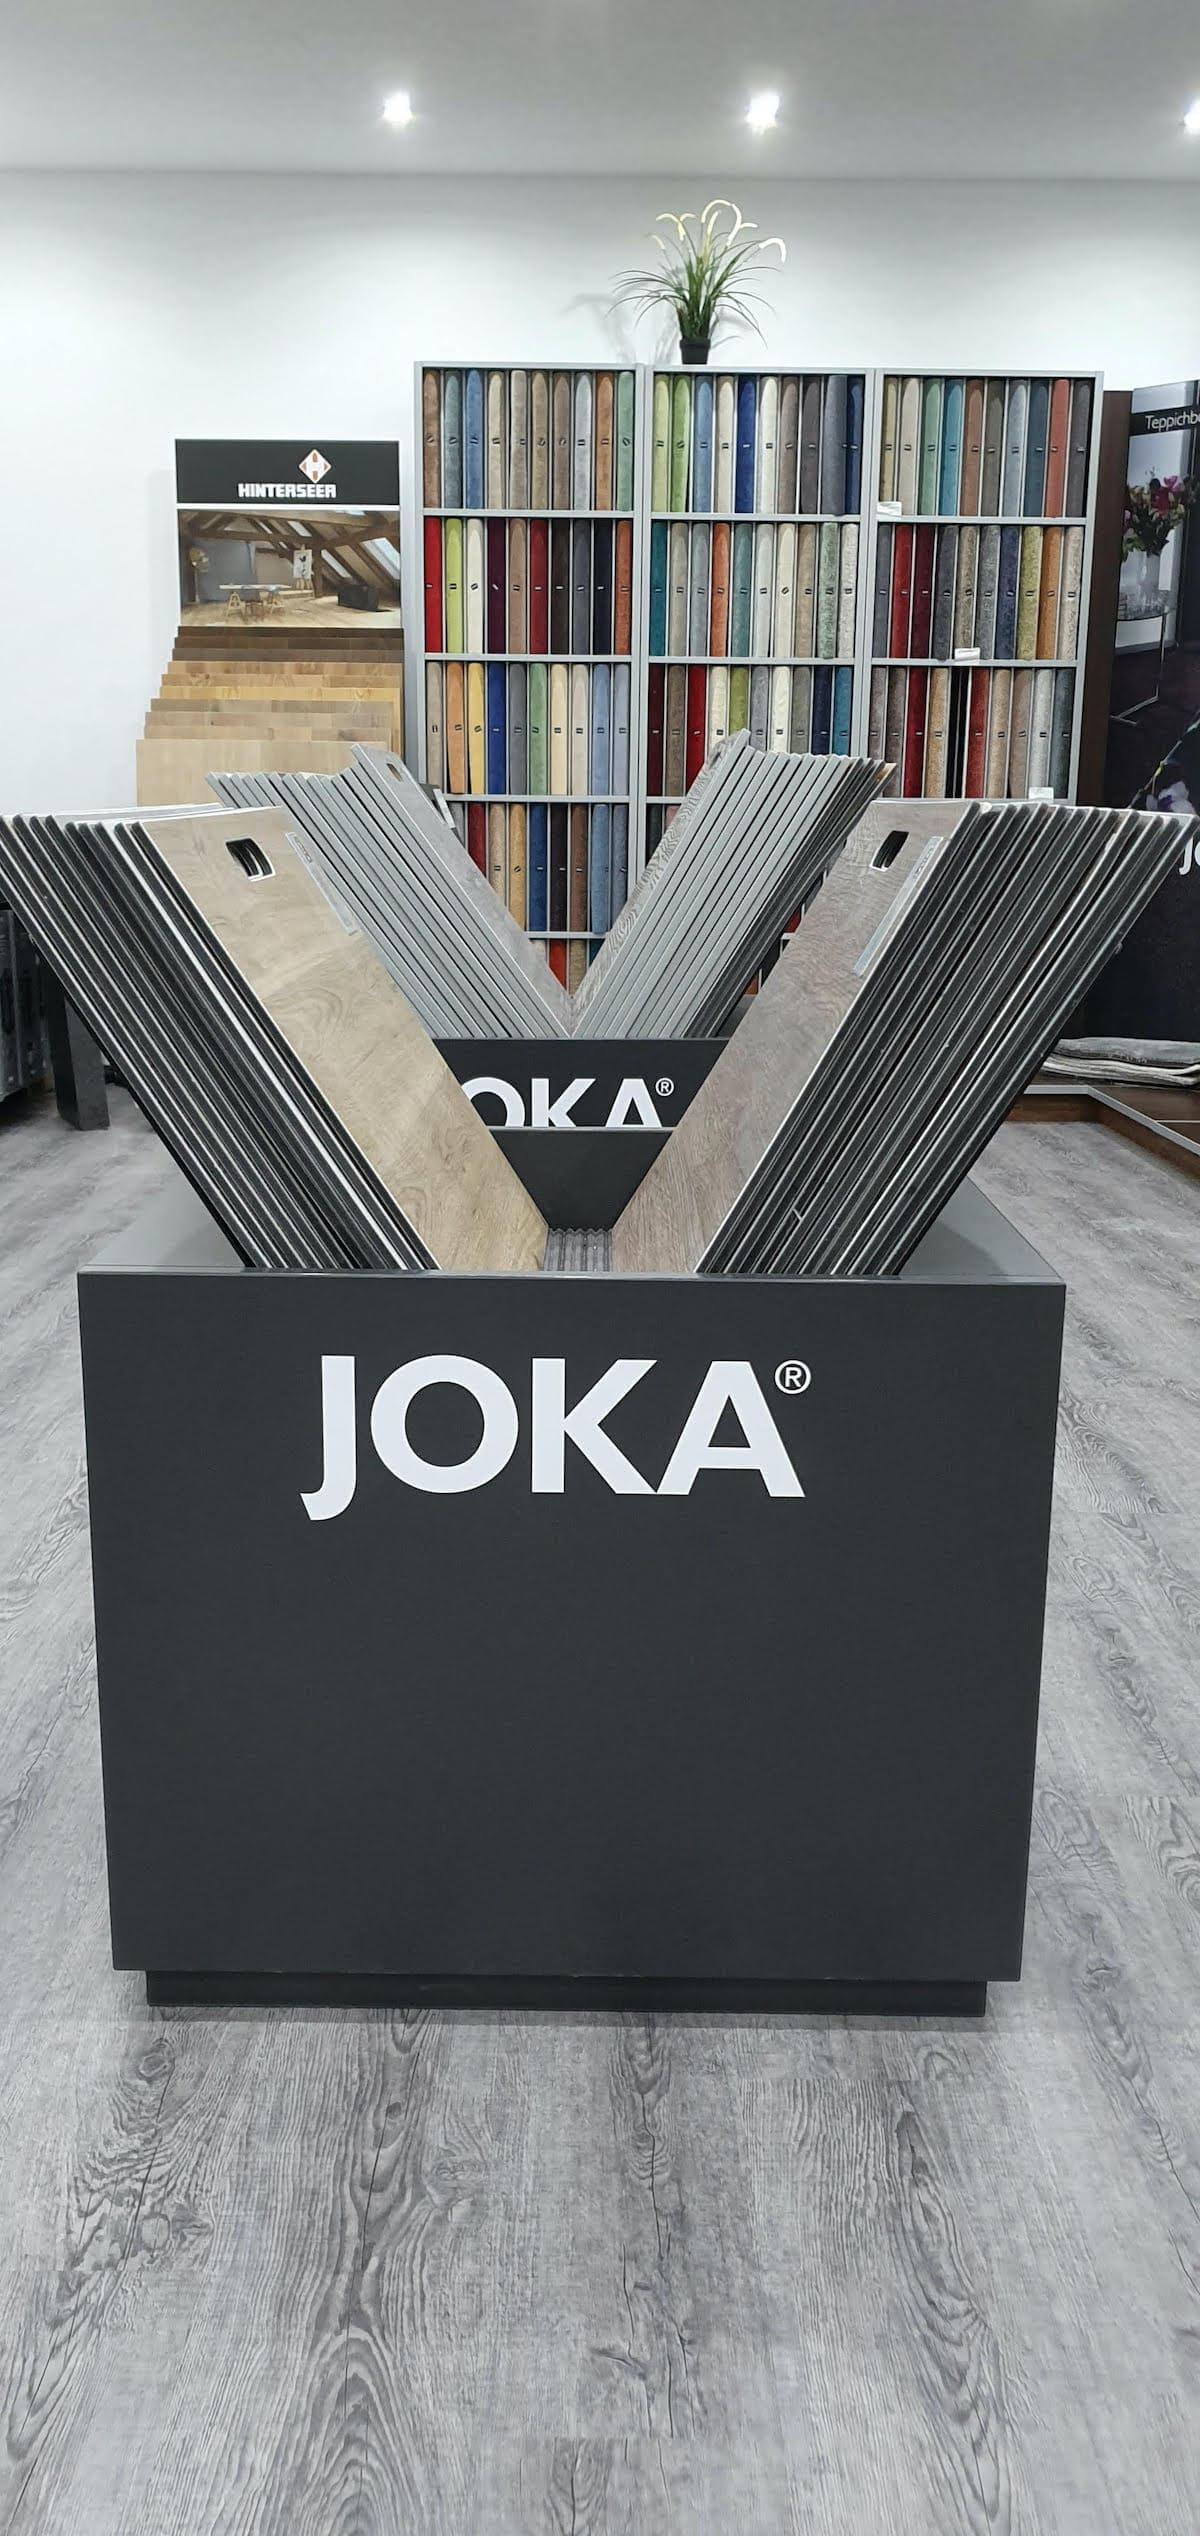 Valon Bodenbeläge Bürstadt Ausstellung Joka laminat